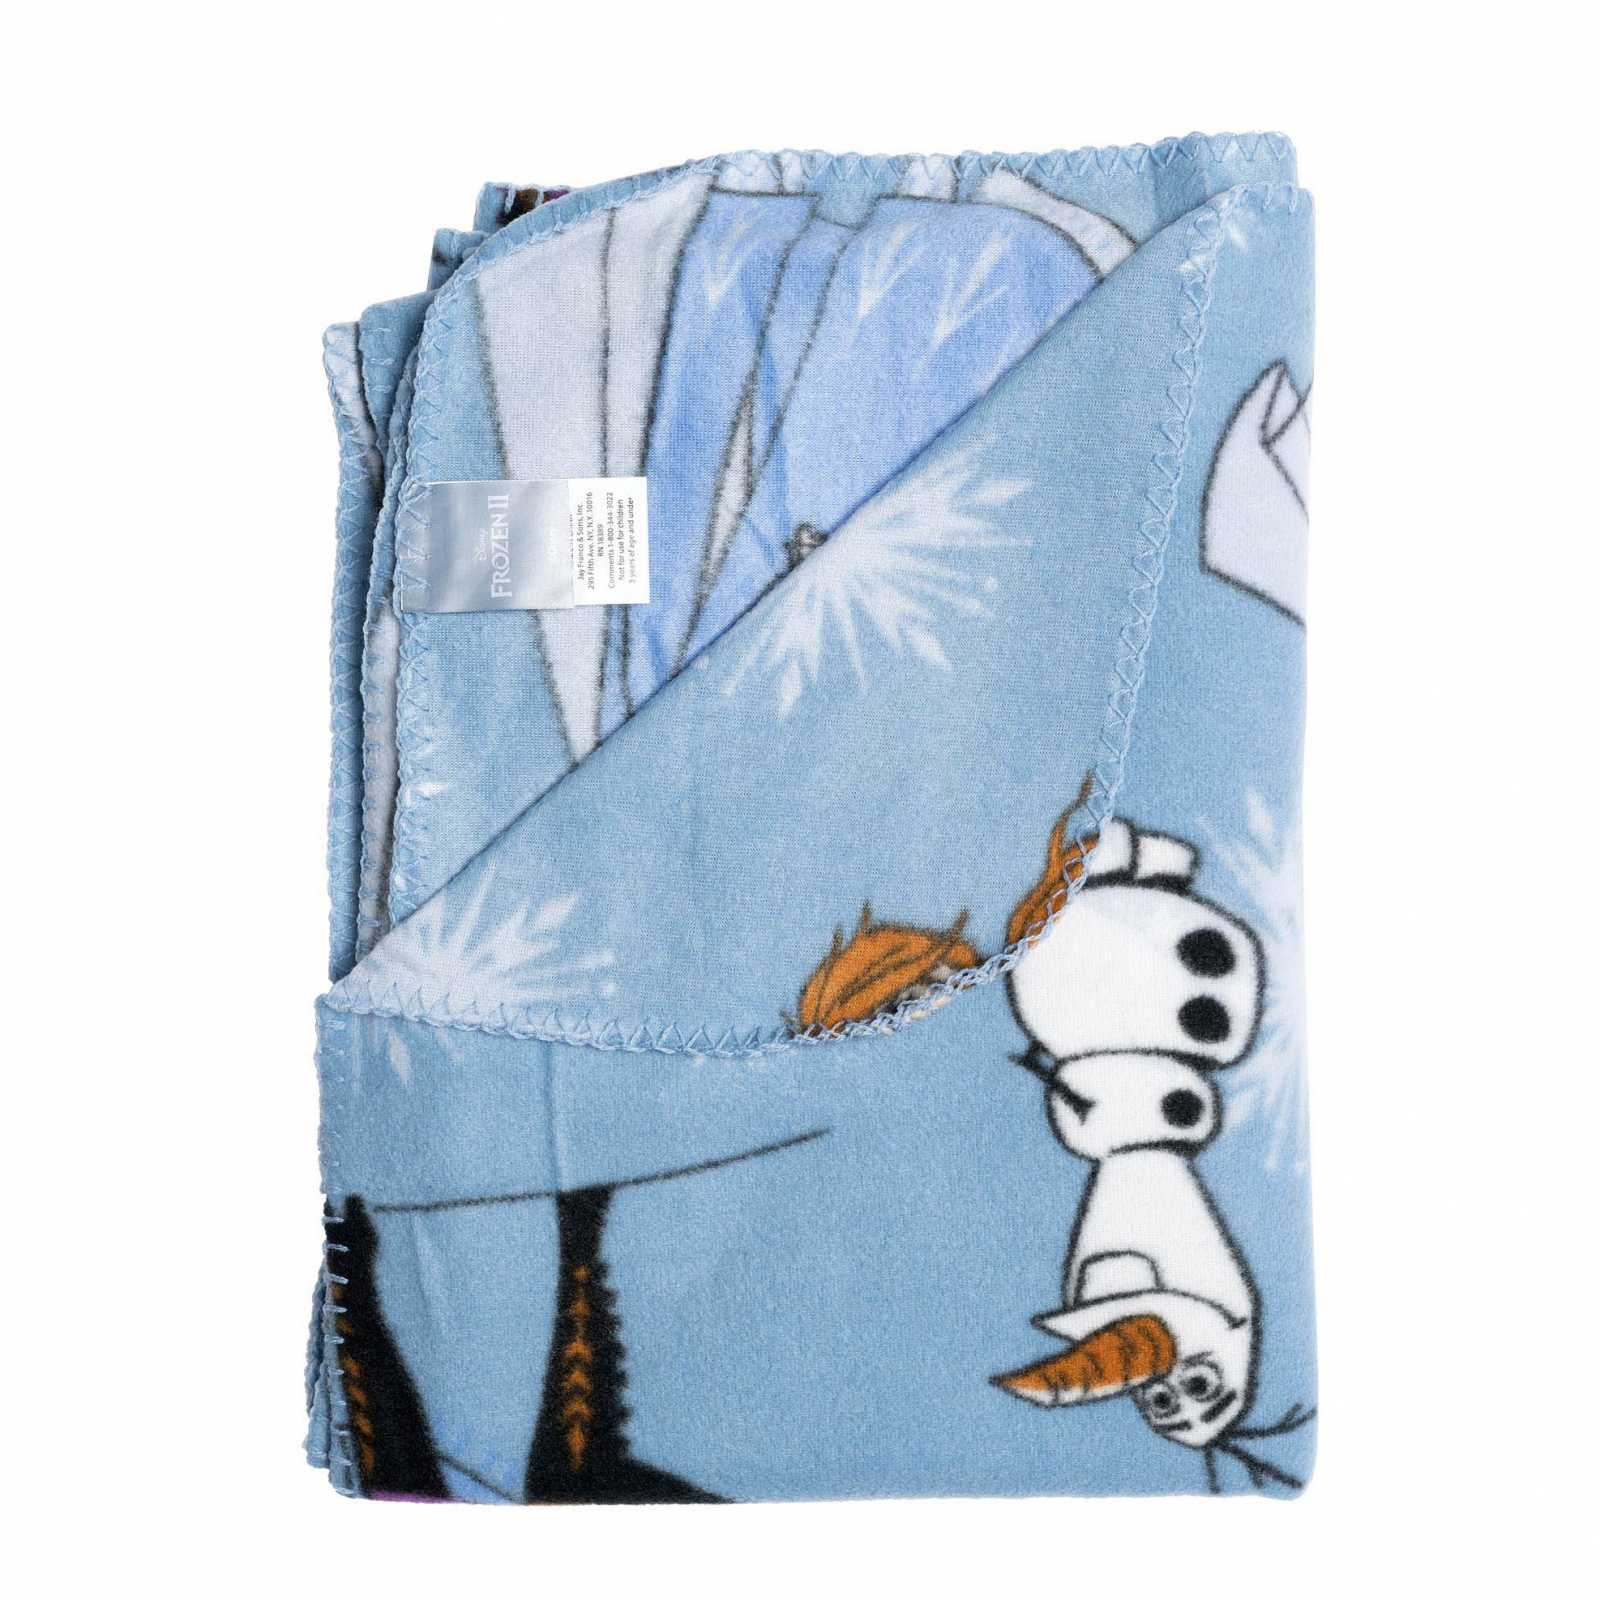 Disney Frozen 2 Plush Fleece Throw Blanket 45 x 60 Inch